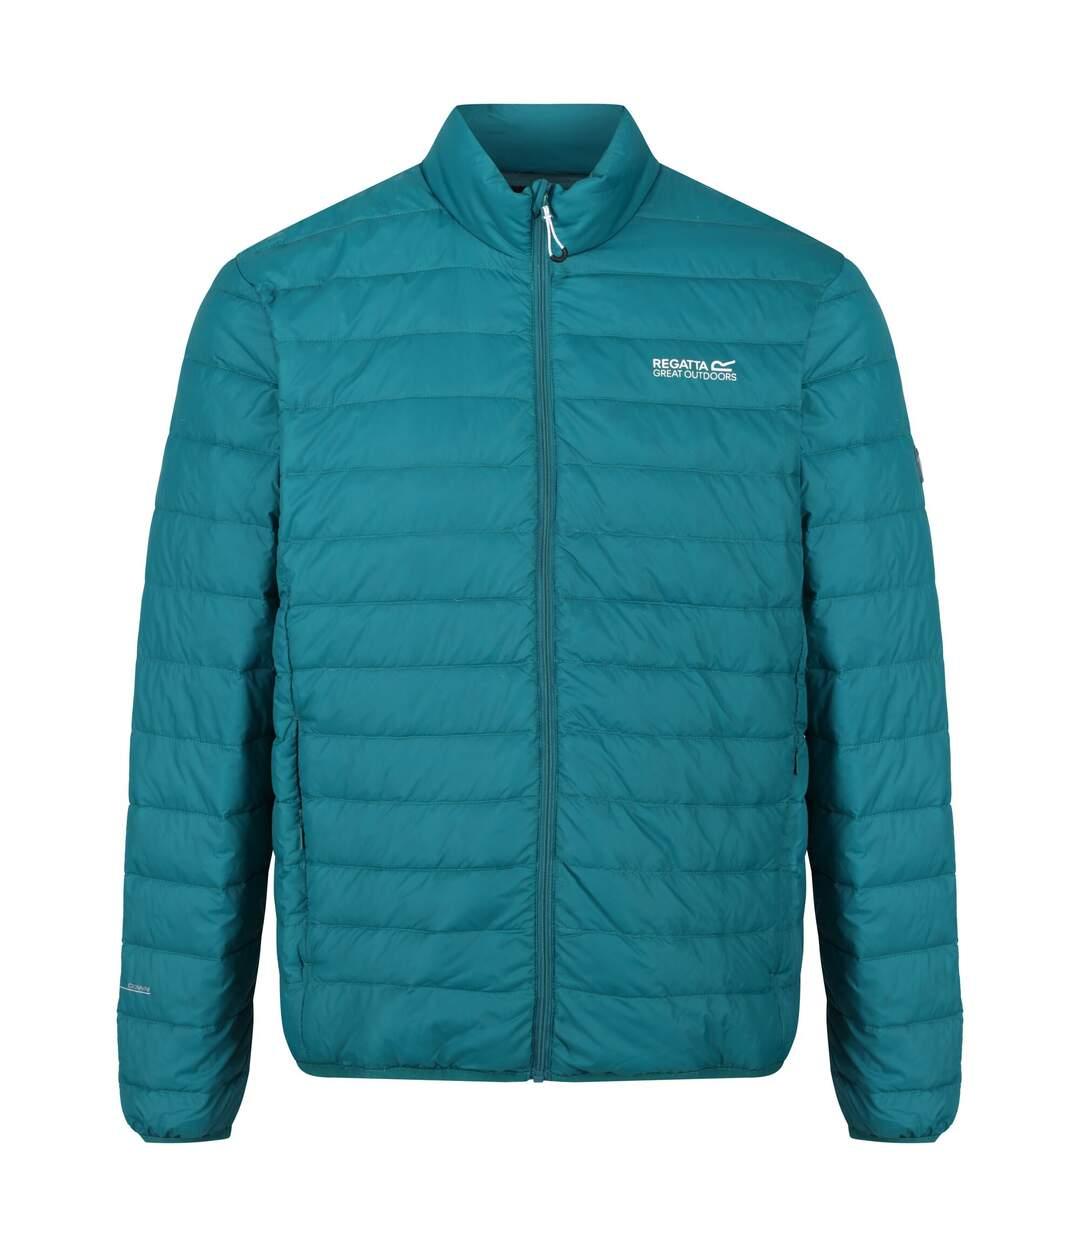 Regatta Mens Whitehill Jacket (Deep Teal) - UTRG4172